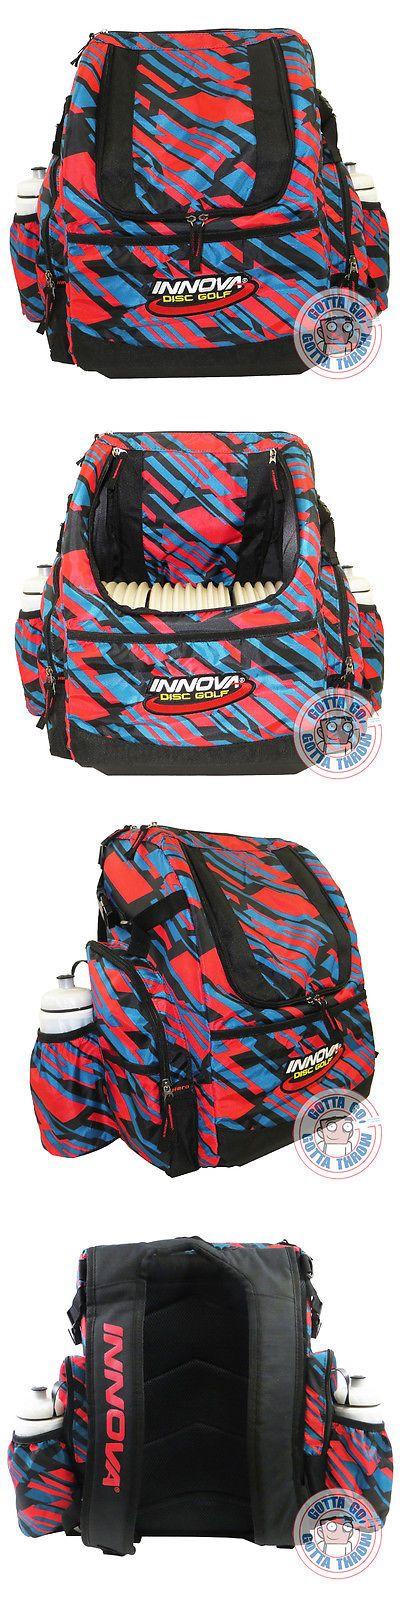 Disc Golf 20851: Innova Heropack Backpack Disc Golf Bag Holds 25+ Discs Brand New - Geometric -> BUY IT NOW ONLY: $79.99 on eBay!